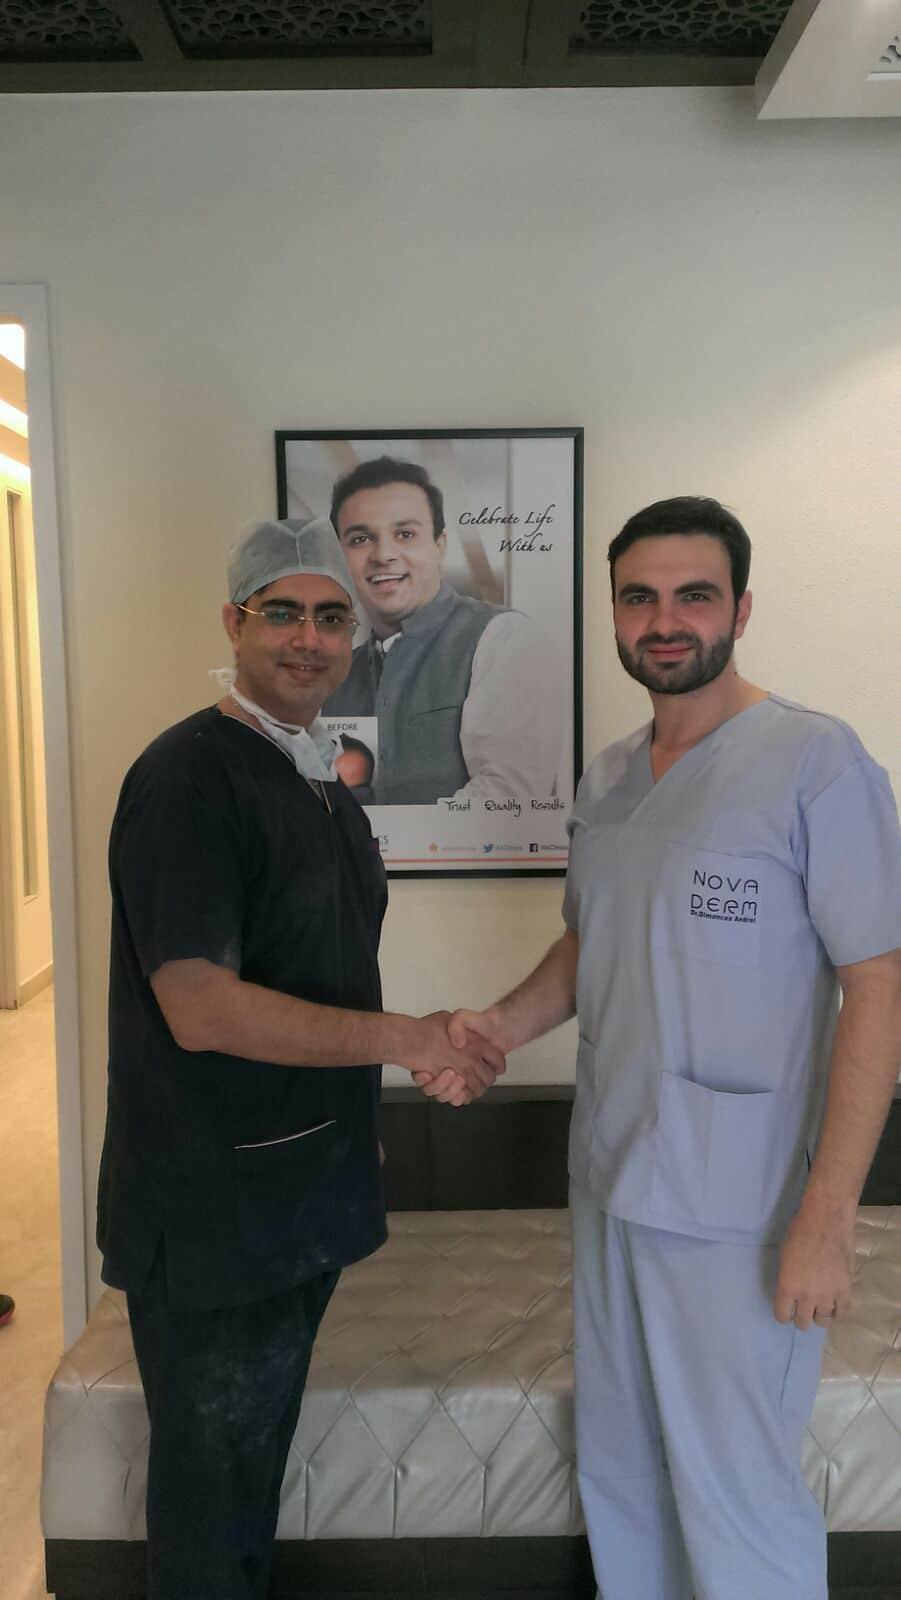 Mou Ak clinics with novaderm